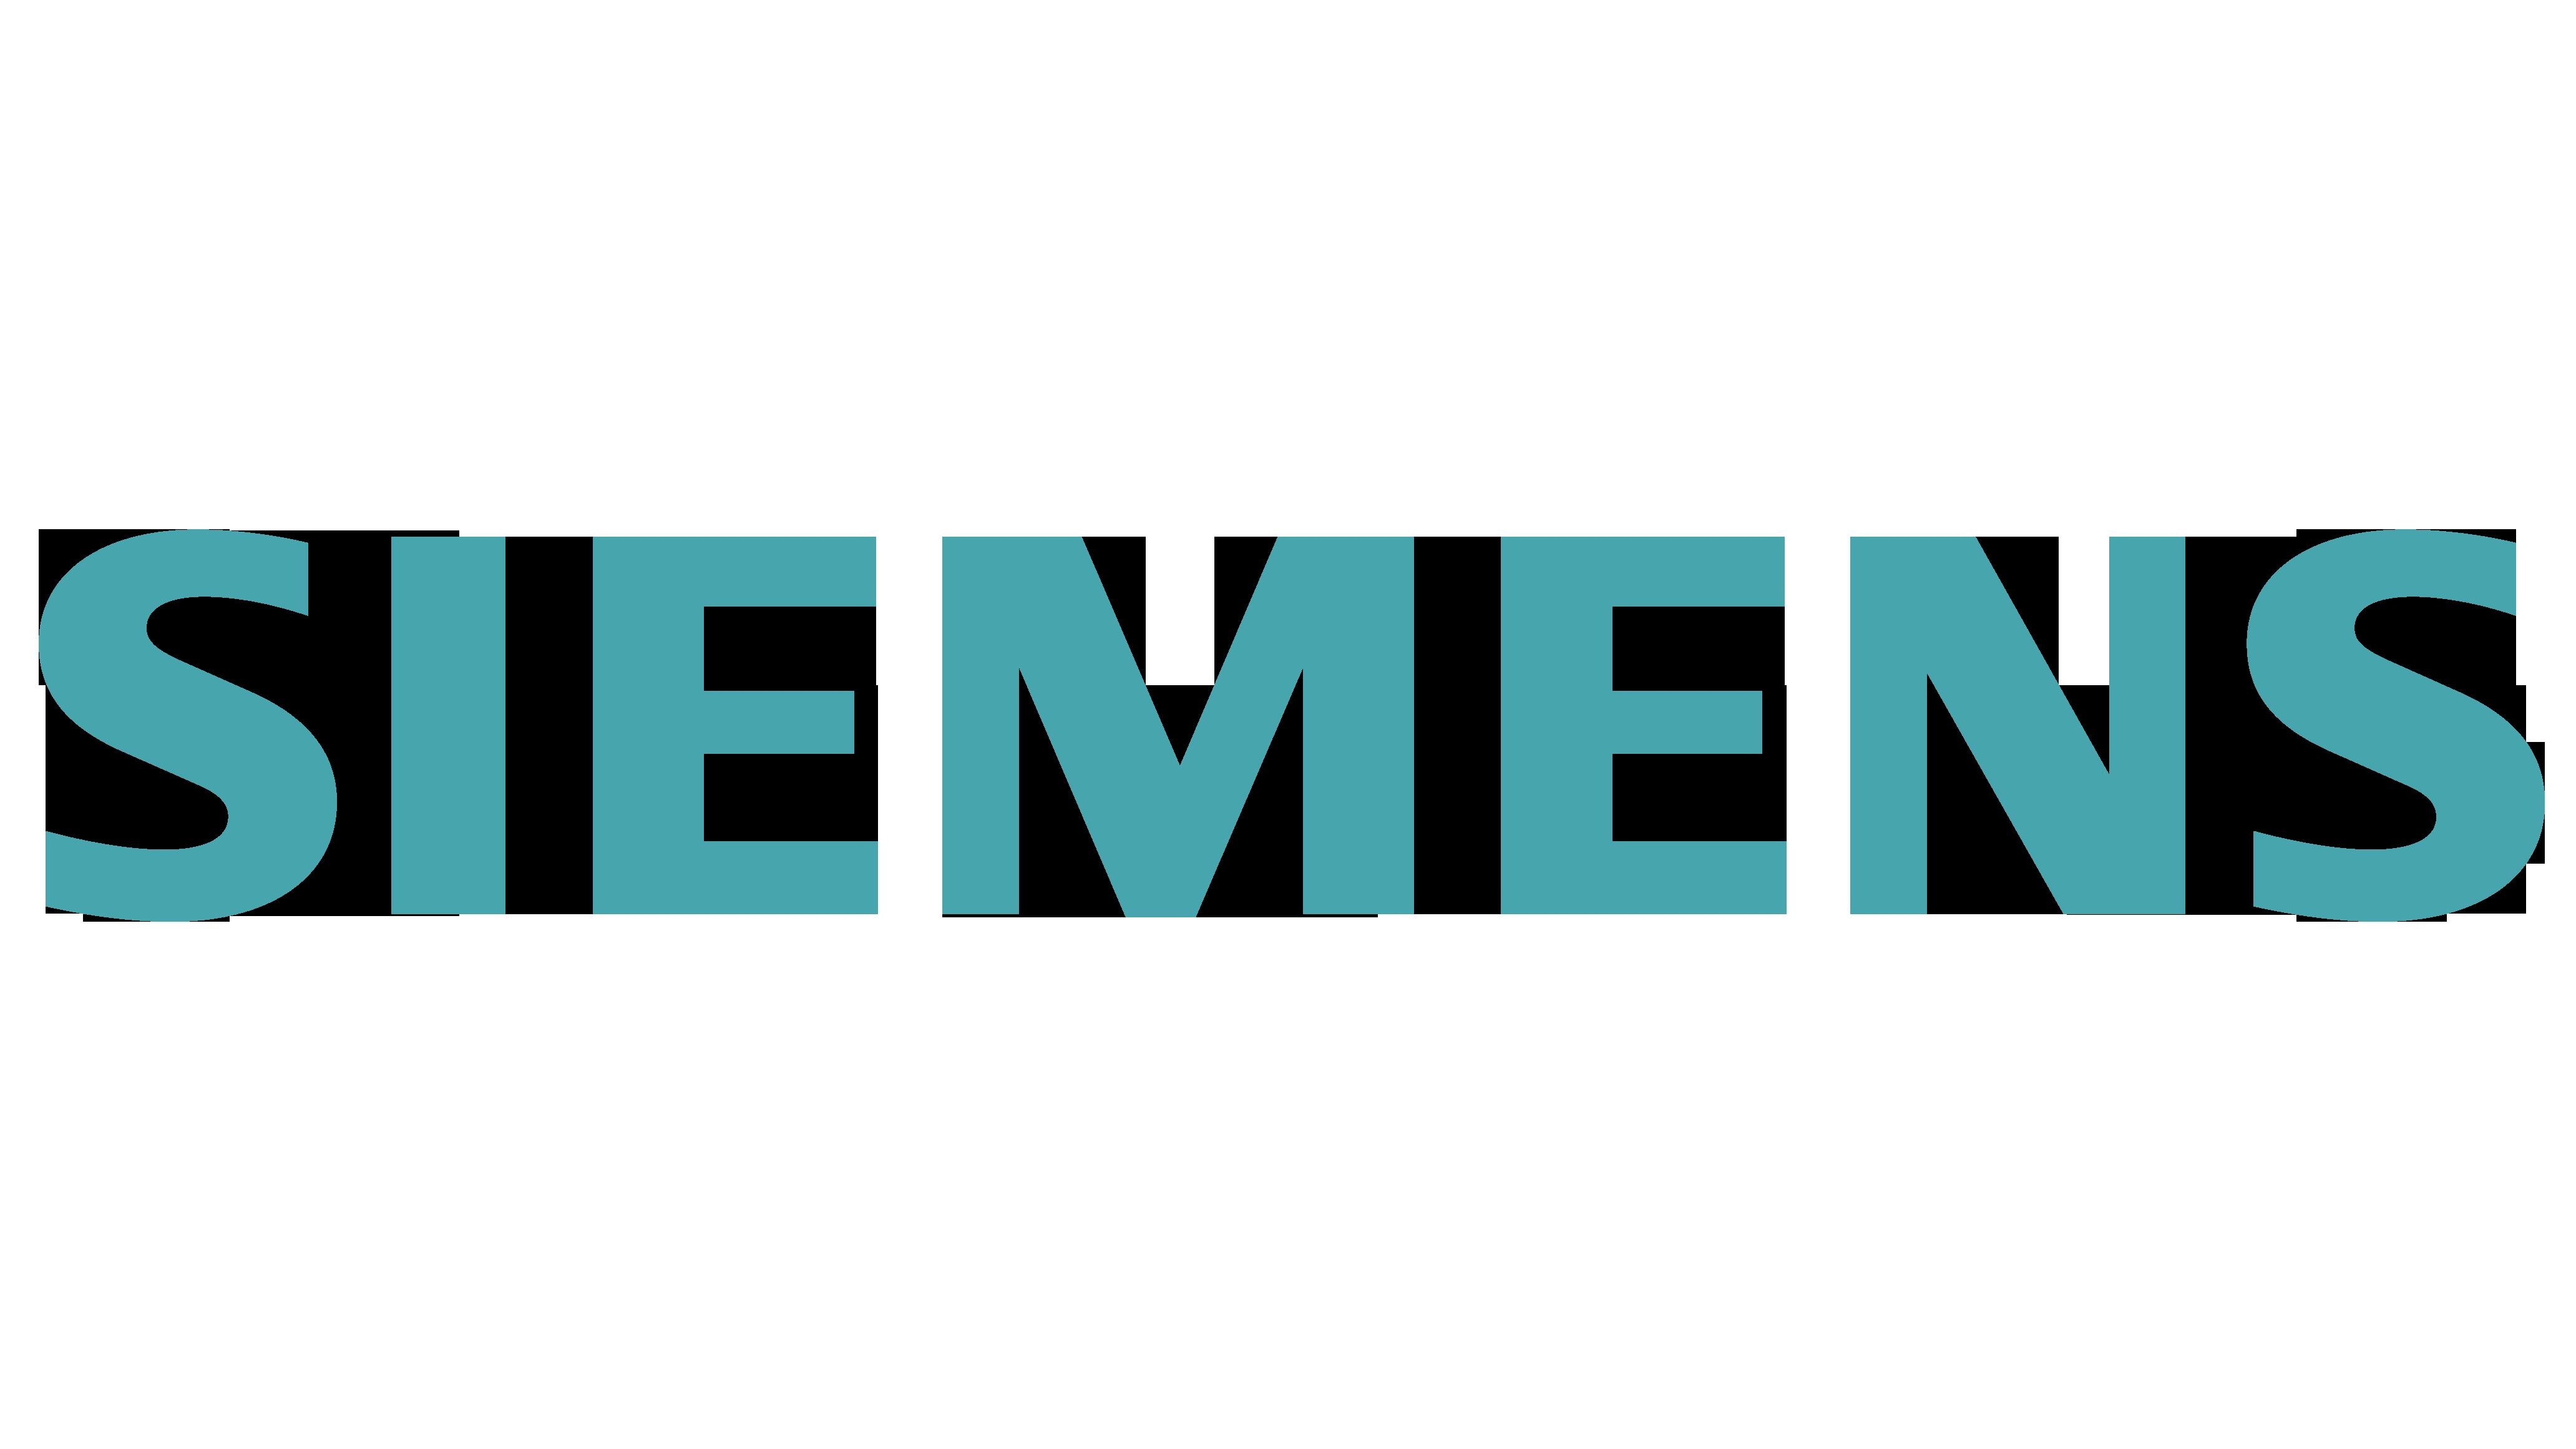 Material Siemens